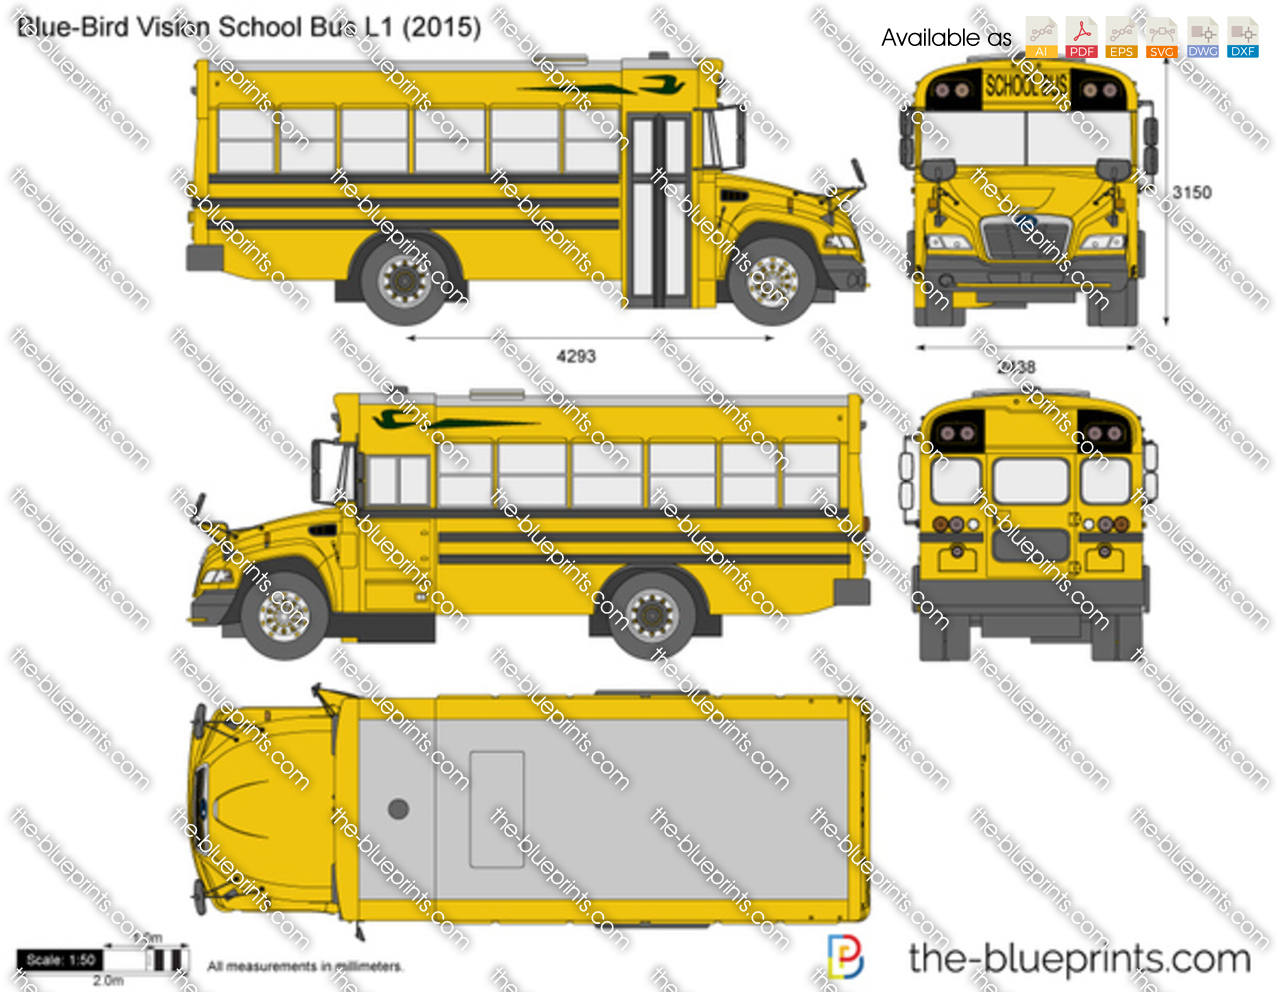 Blue-Bird Vision School Bus L1